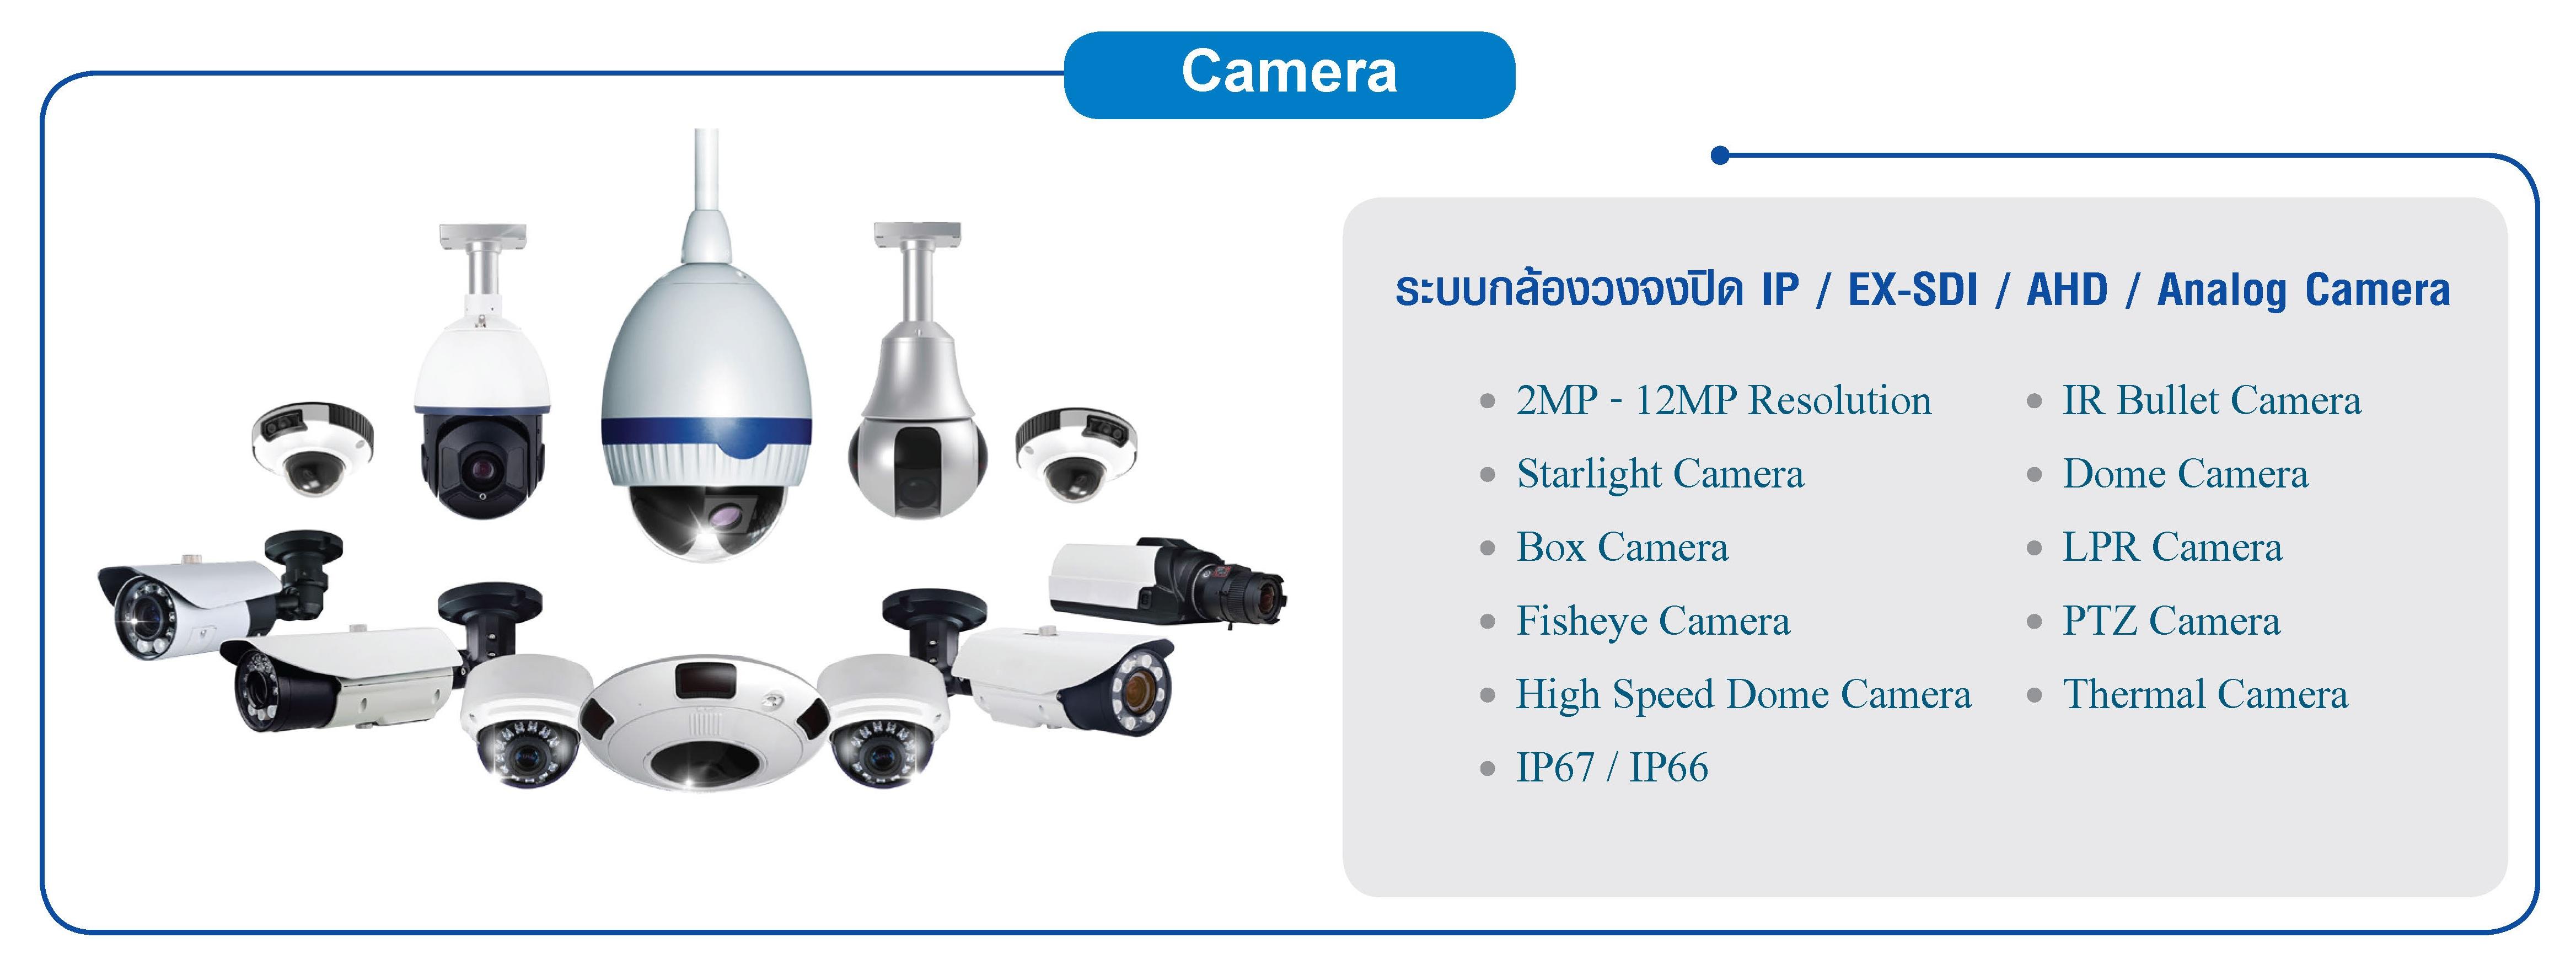 CCTV รายละเอียด